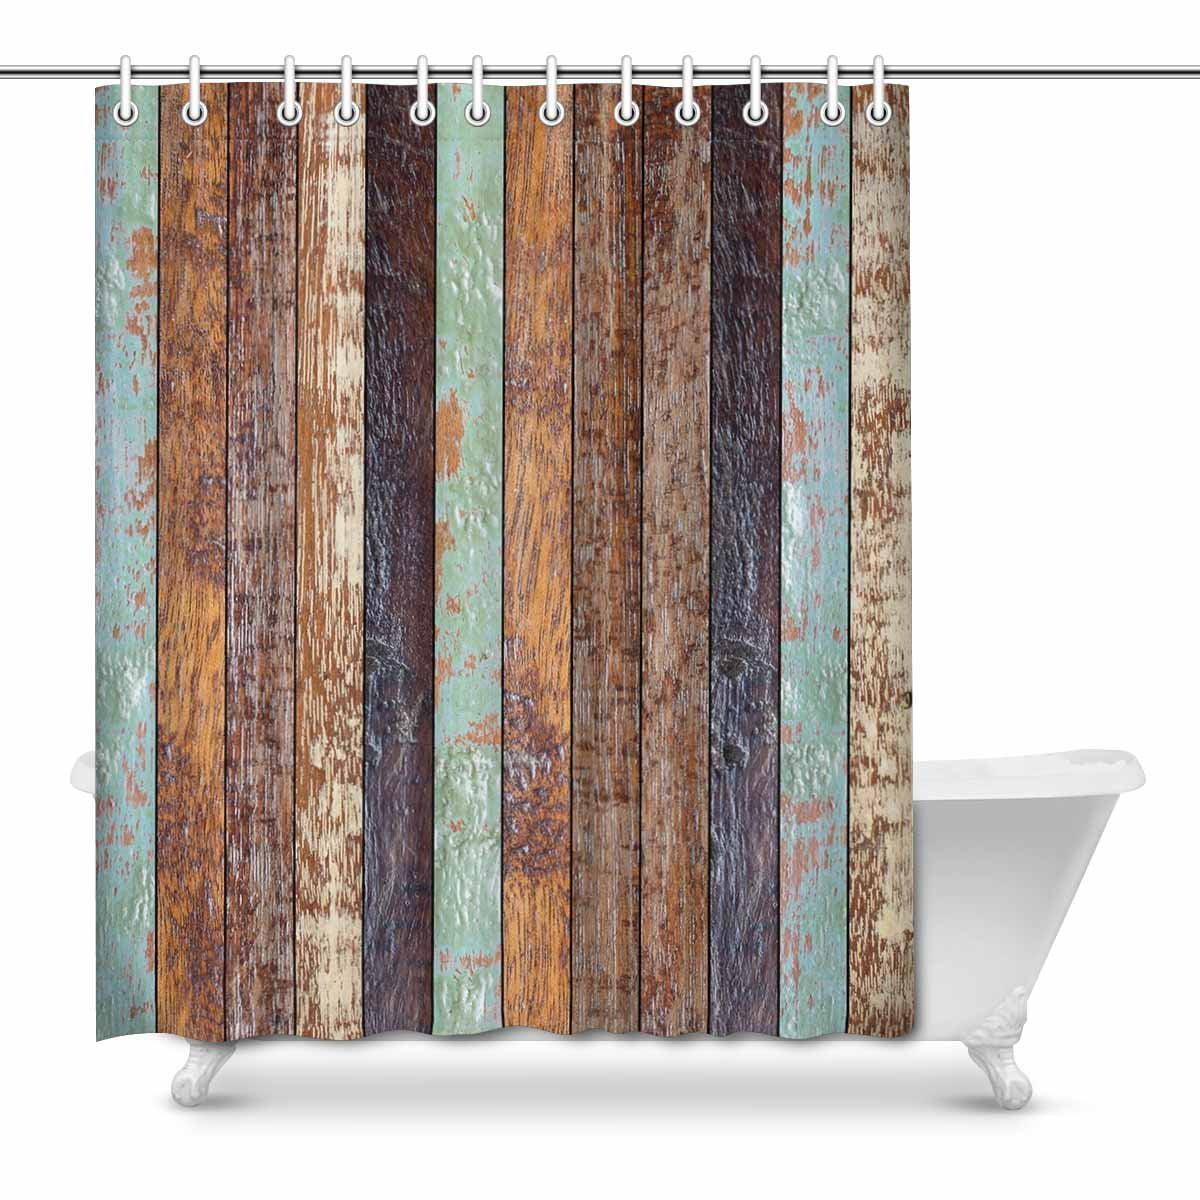 Waterproof Fabric Rustic Wood Board Flowers Shower Curtain Set Bathroom Hooks